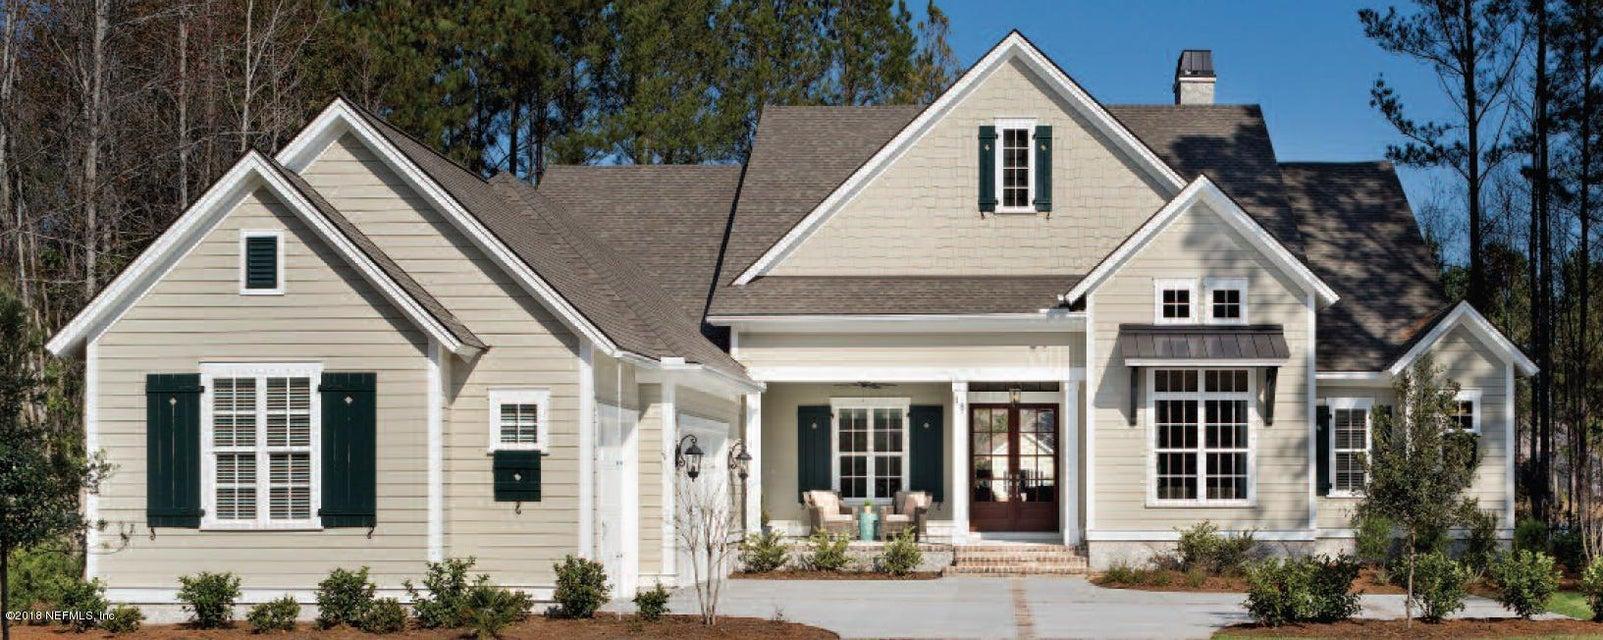 450 ROYAL TERN, JACKSONVILLE BEACH, FLORIDA 32250, 3 Bedrooms Bedrooms, ,3 BathroomsBathrooms,Residential - single family,For sale,ROYAL TERN,922632